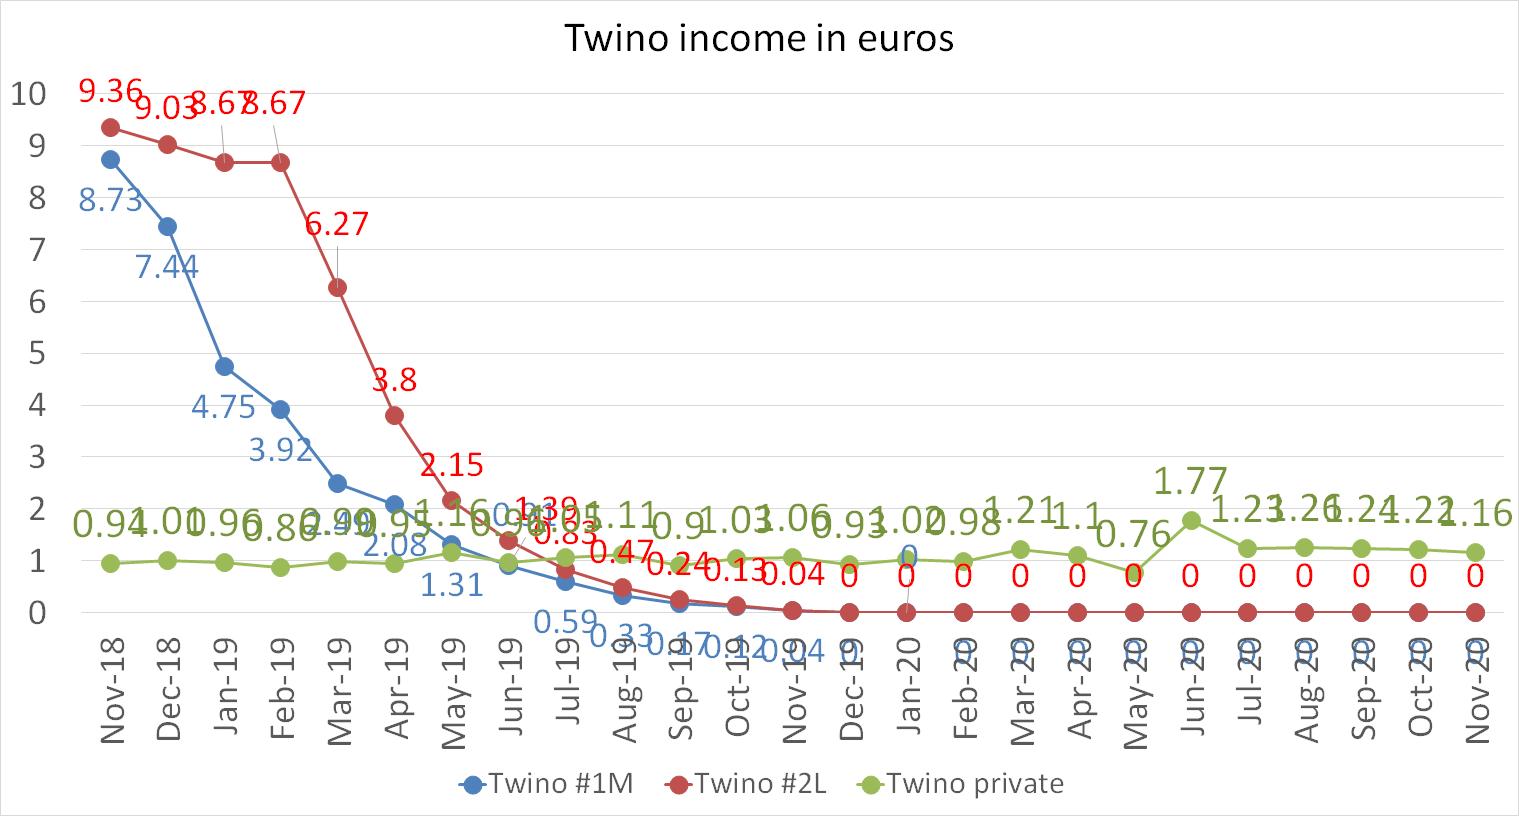 Twino income in euros november 2020